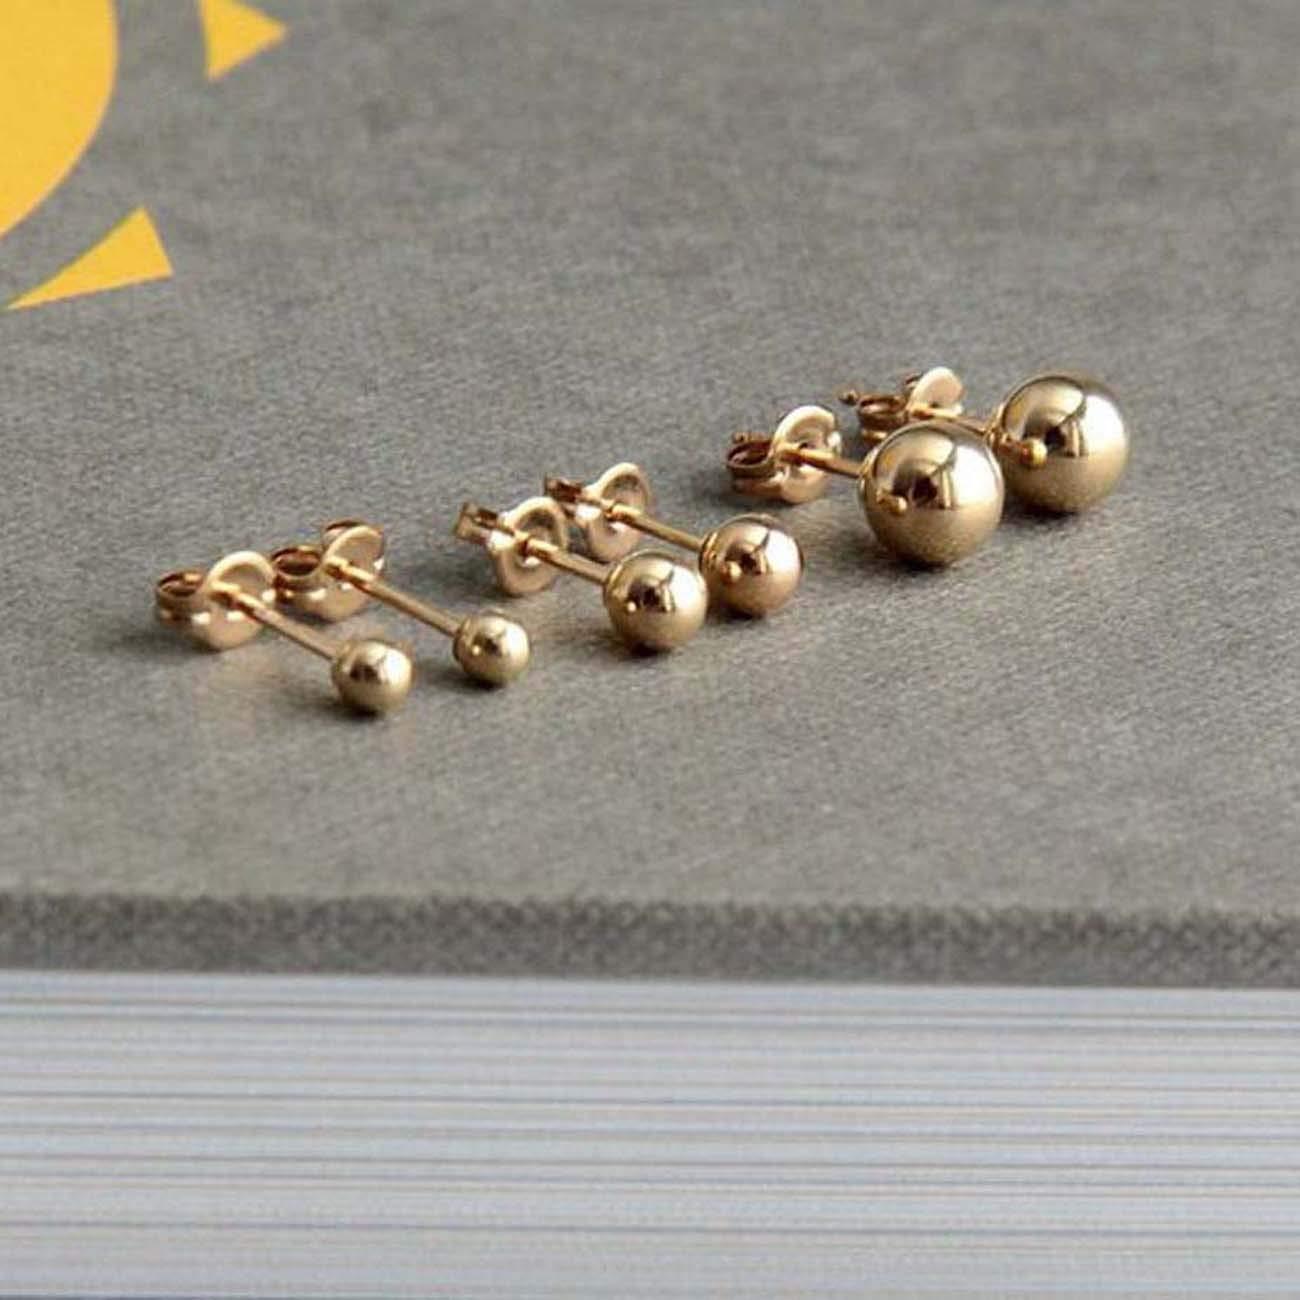 14k Yellow Gold Over.925 Sterling Silver 3mm 5mm Ball Earrings Stud Earrings For Womens /& Girls 4mm